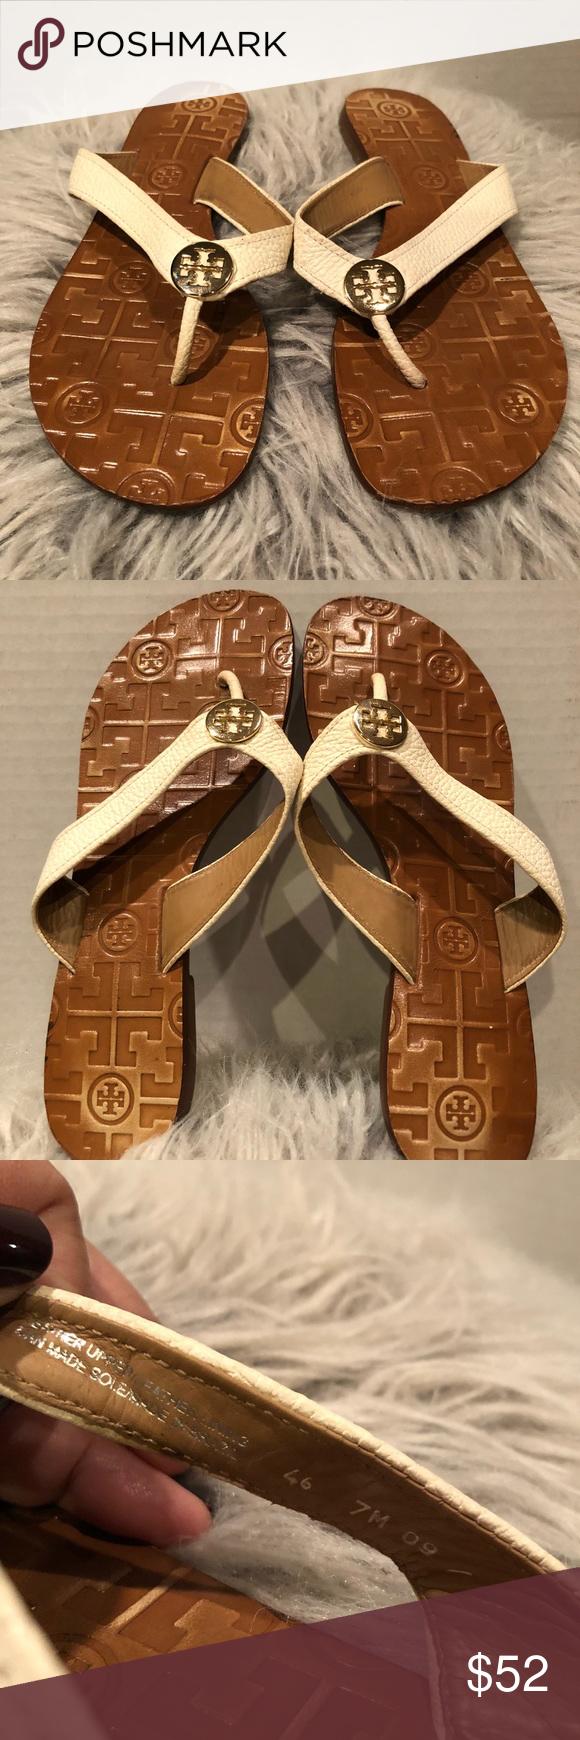 "f55afe06ee97 Tory Burch ""Thora"" thong sandals - sz. 7 EUC Tory Burch ""Thora ..."